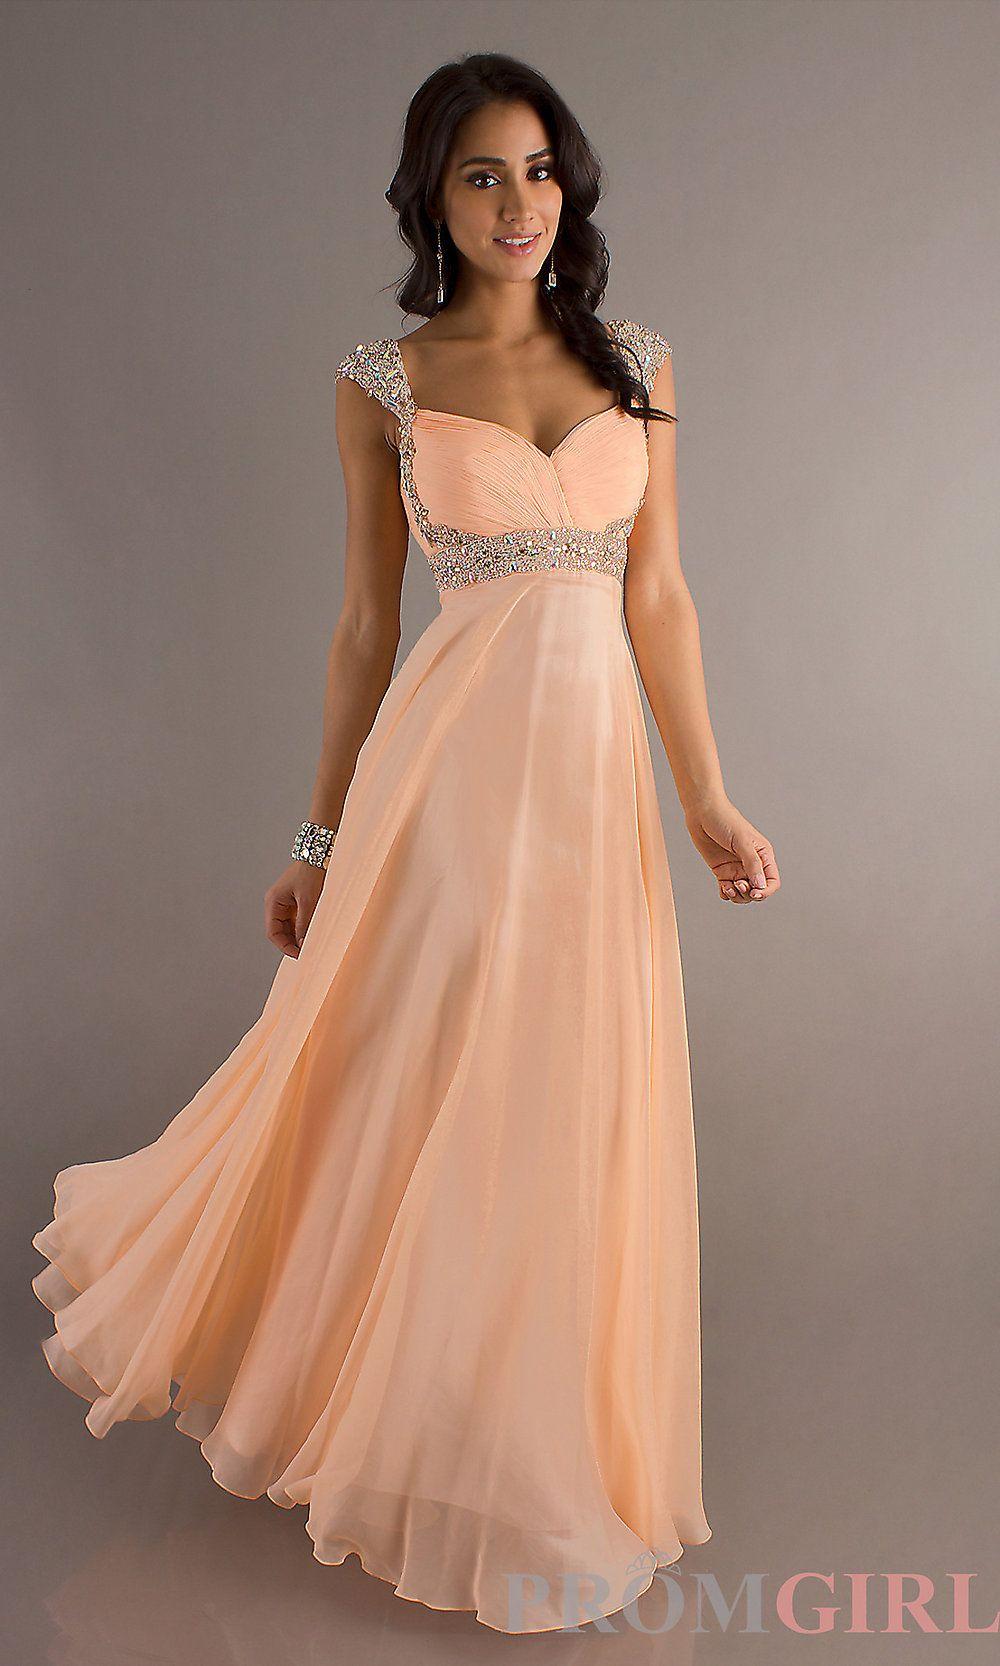 Long Cap Sleeve Prom Dress, Beaded Cap Sleeve Prom Gown- PromGirl ...